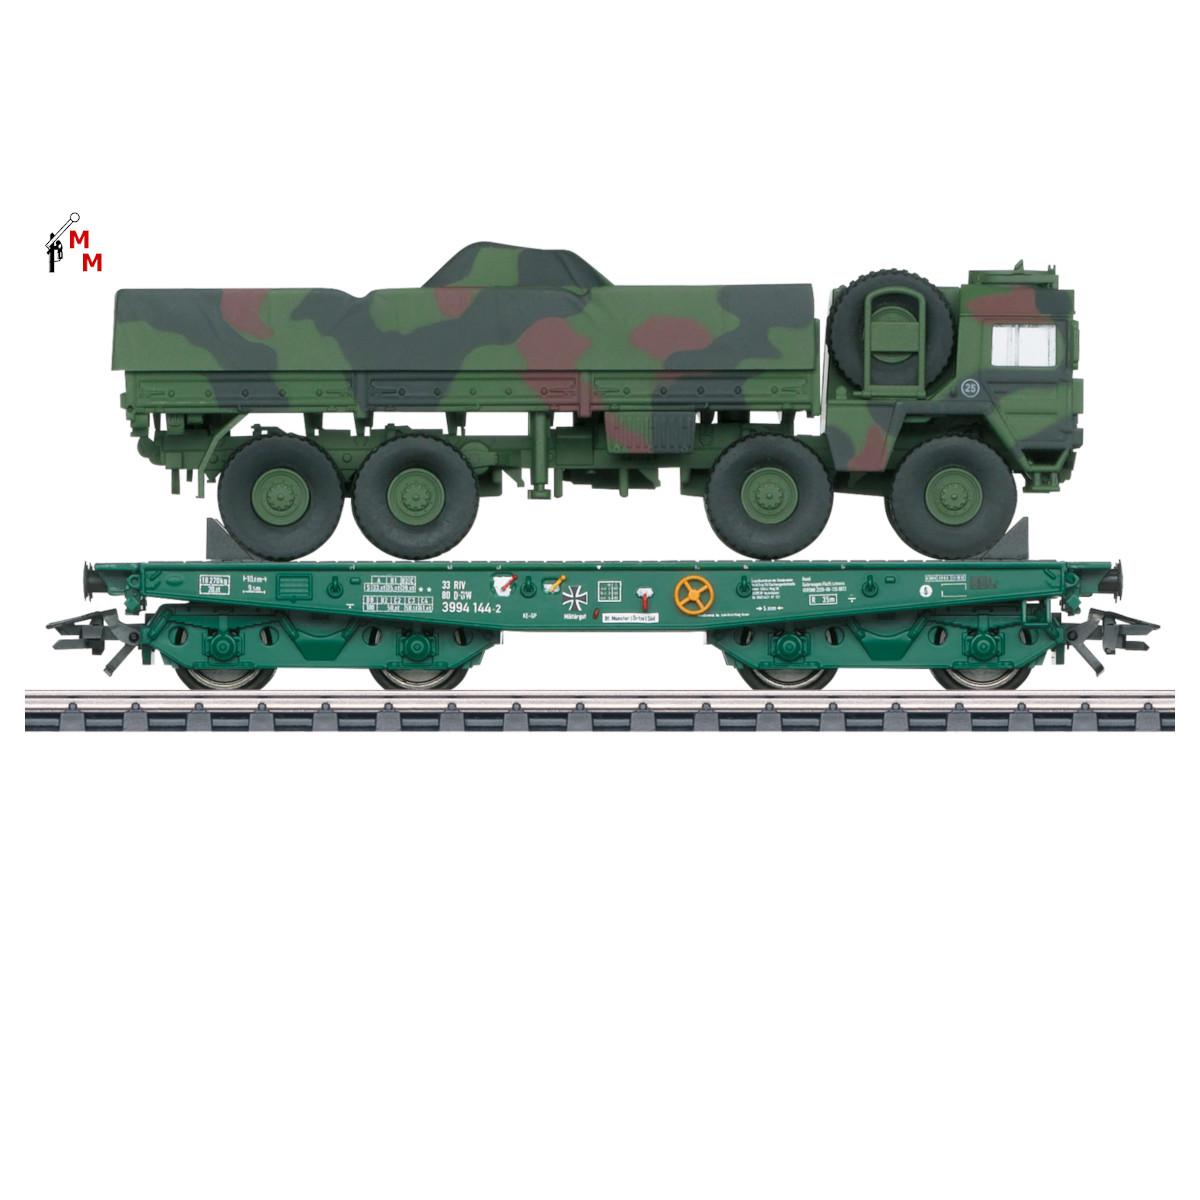 (Neu) Märklin 48875 Schwerlastflachwagen Rimmps, Ladegut; MAN, Ep.VI,